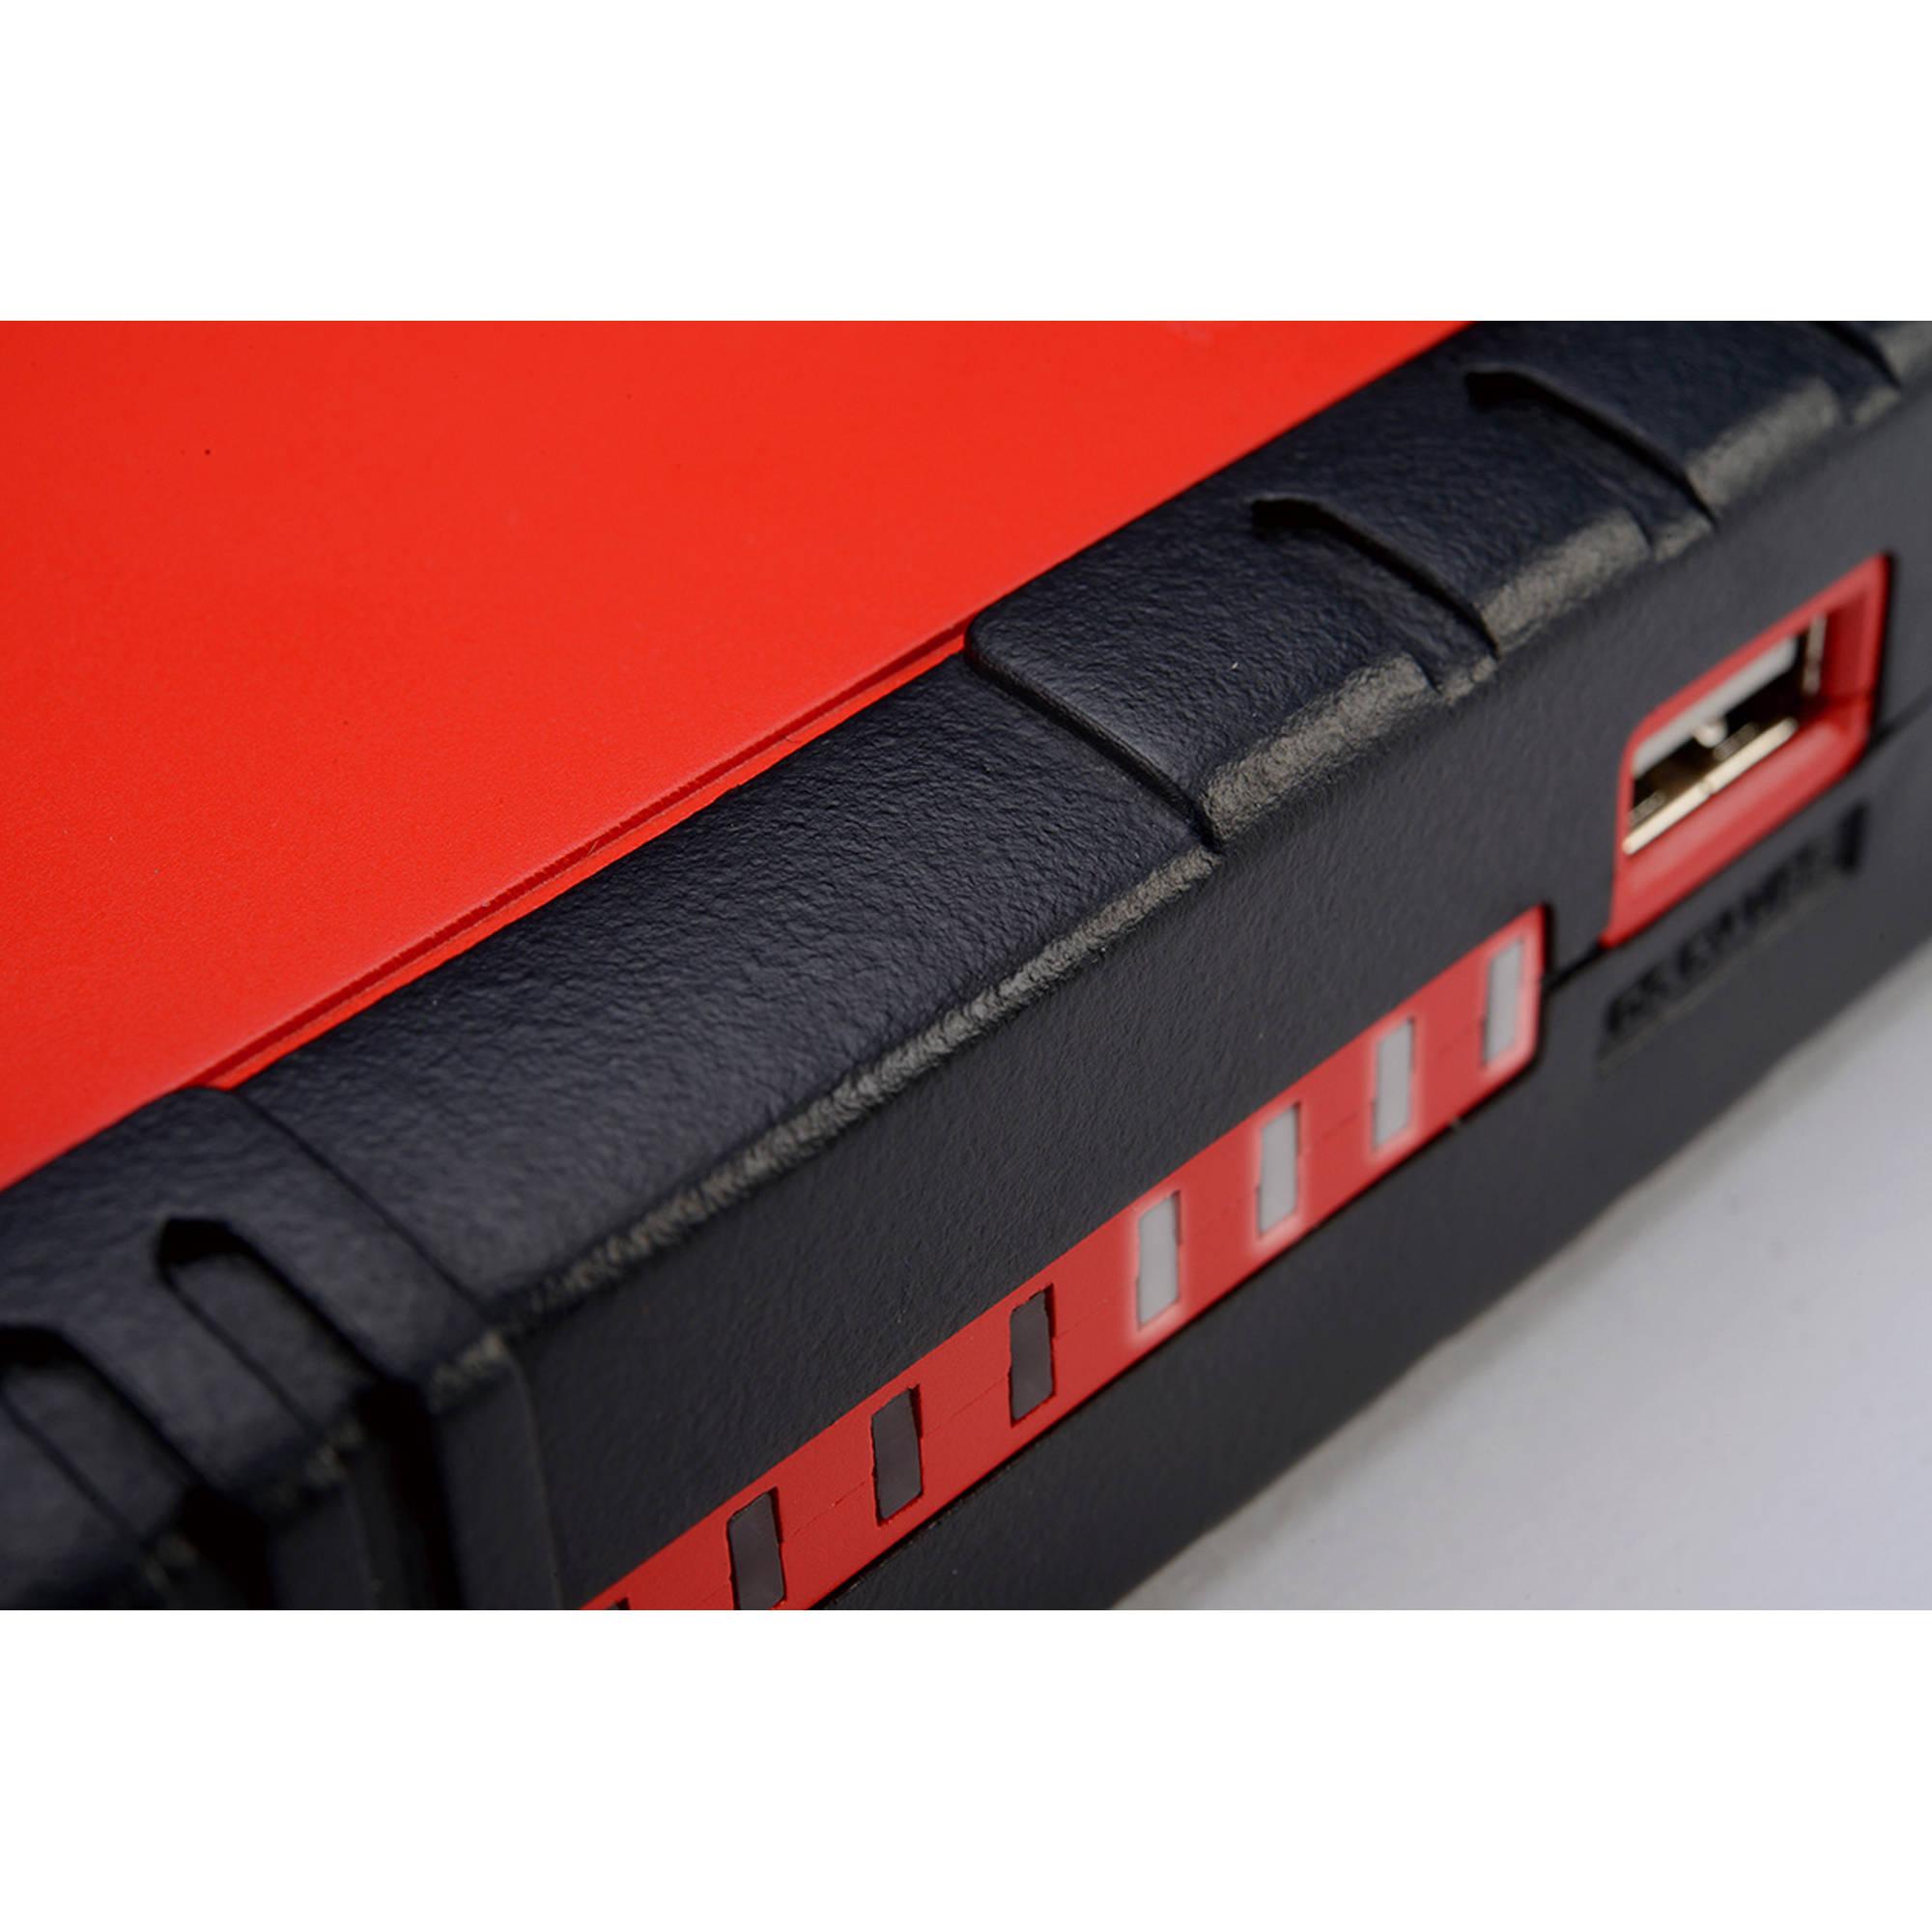 Everstart Multi Function Jump Starter Amp Battery Charger As Combo 95 Wiring Diagram